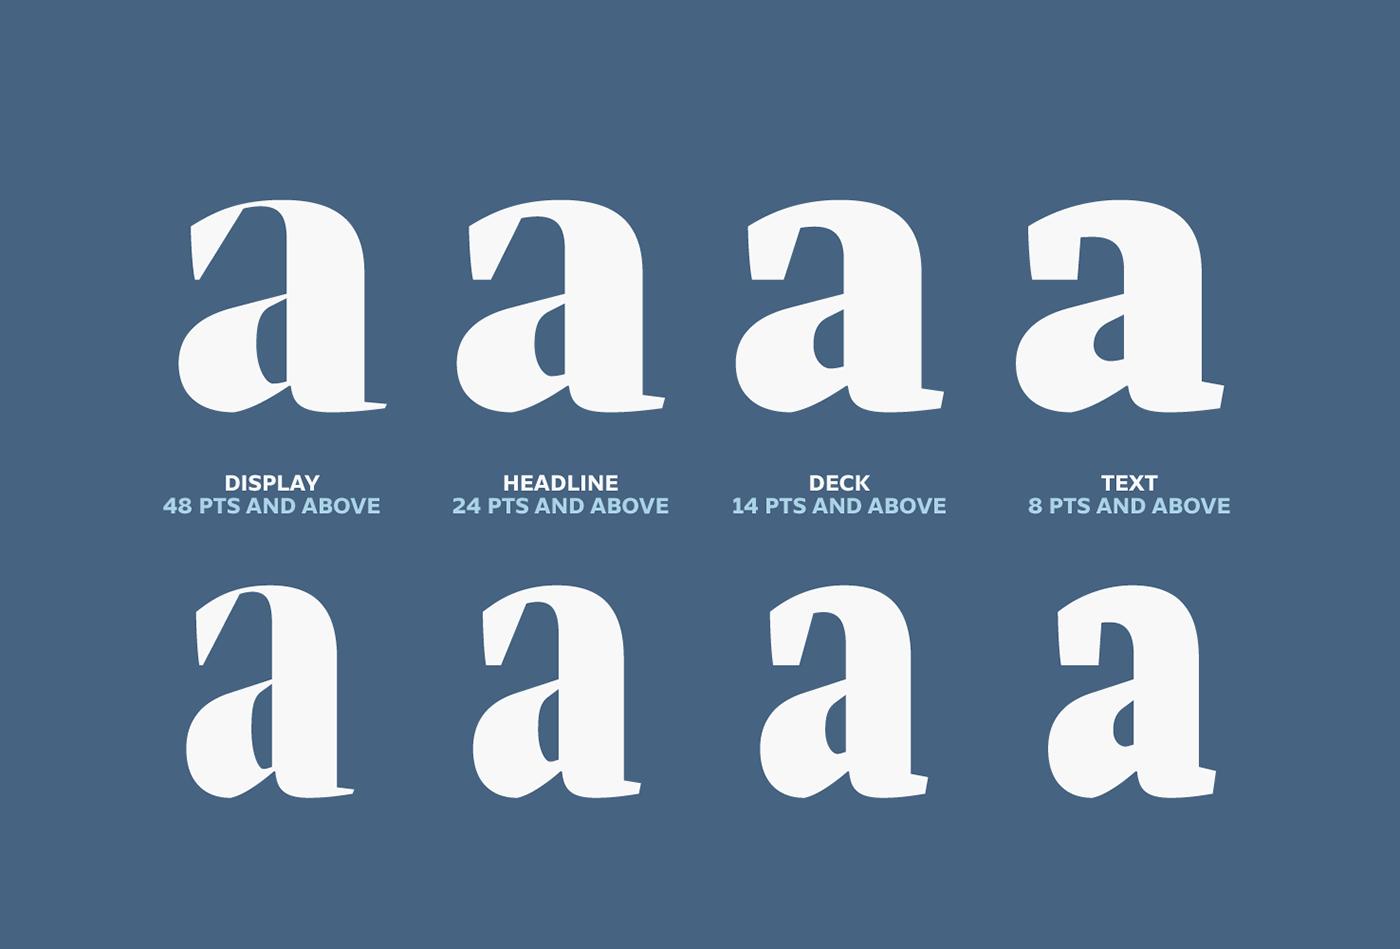 Display deck text Headline DSType Pedro Leal Typeface font mafra